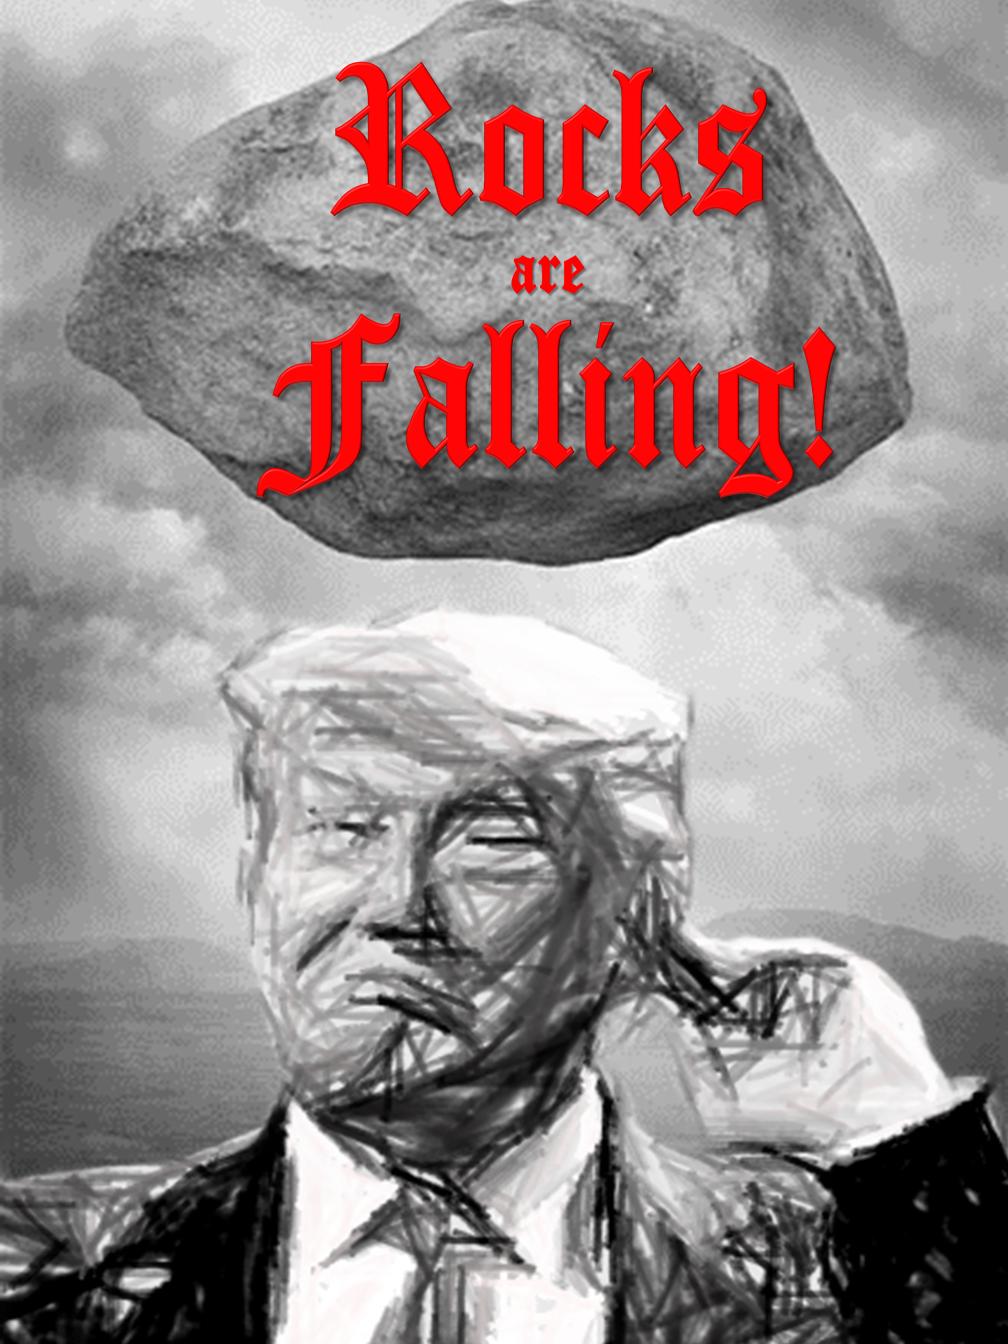 Rocks are Falling